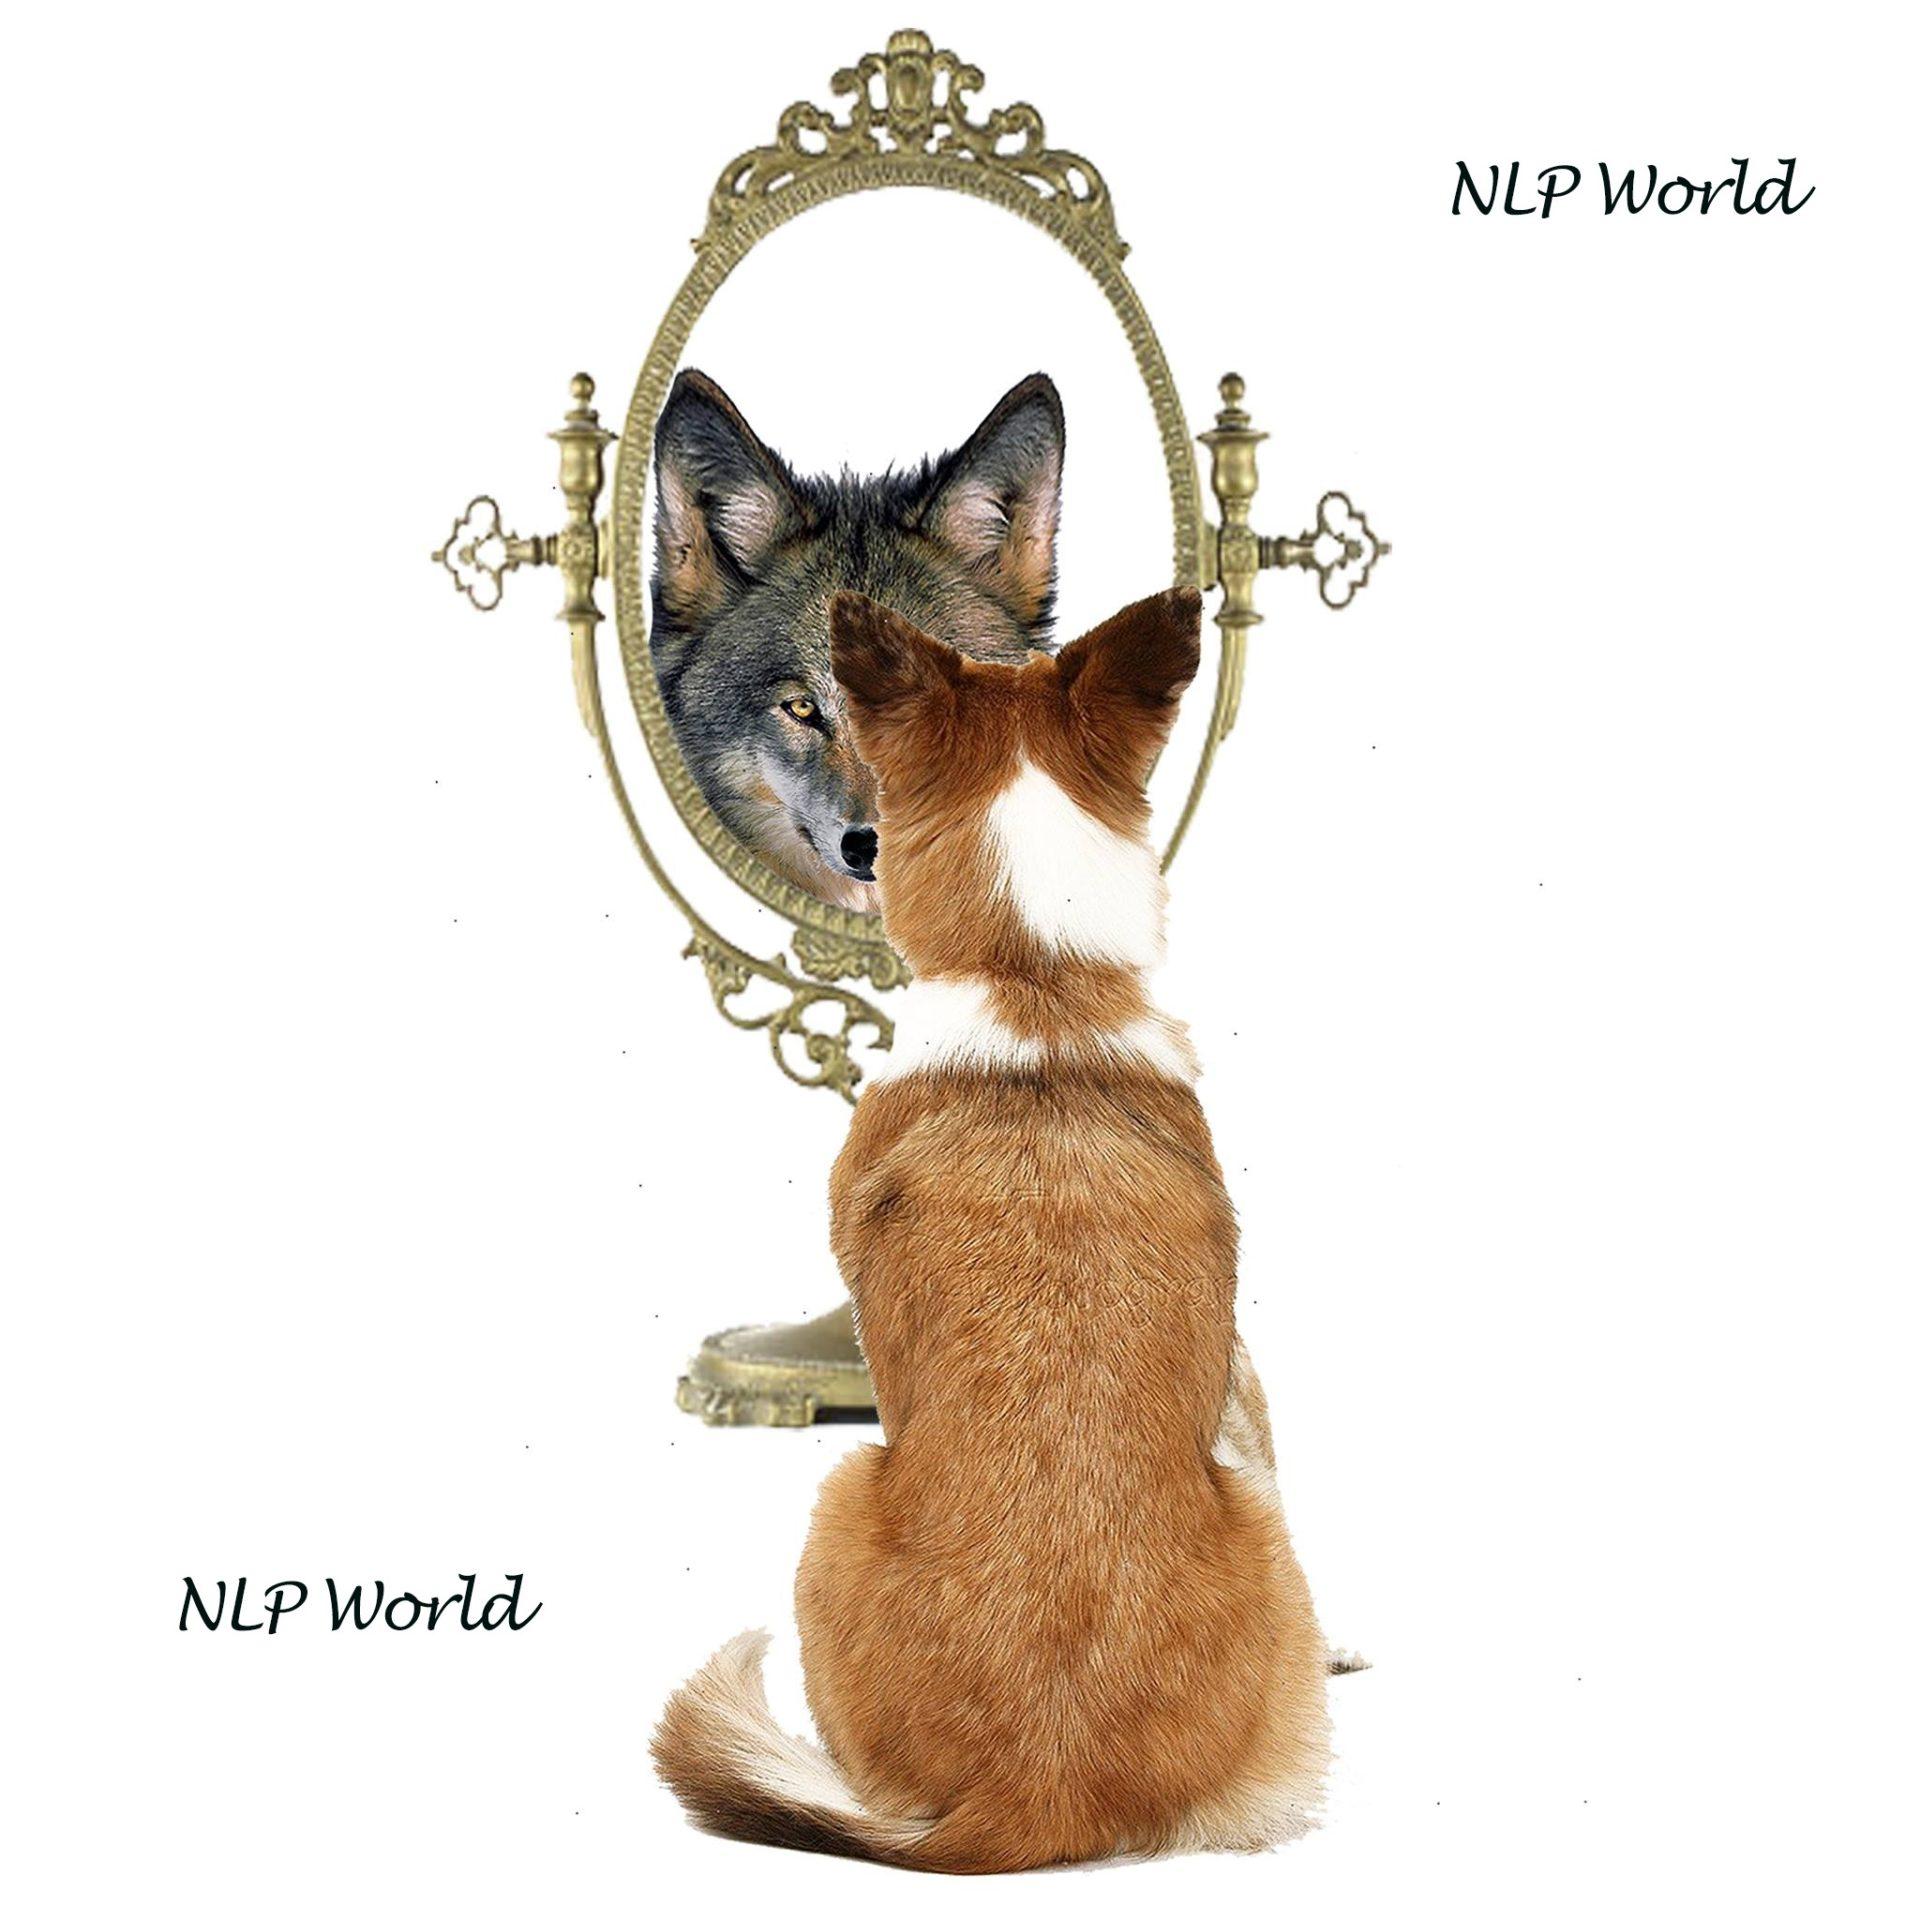 nlp perceptual positions